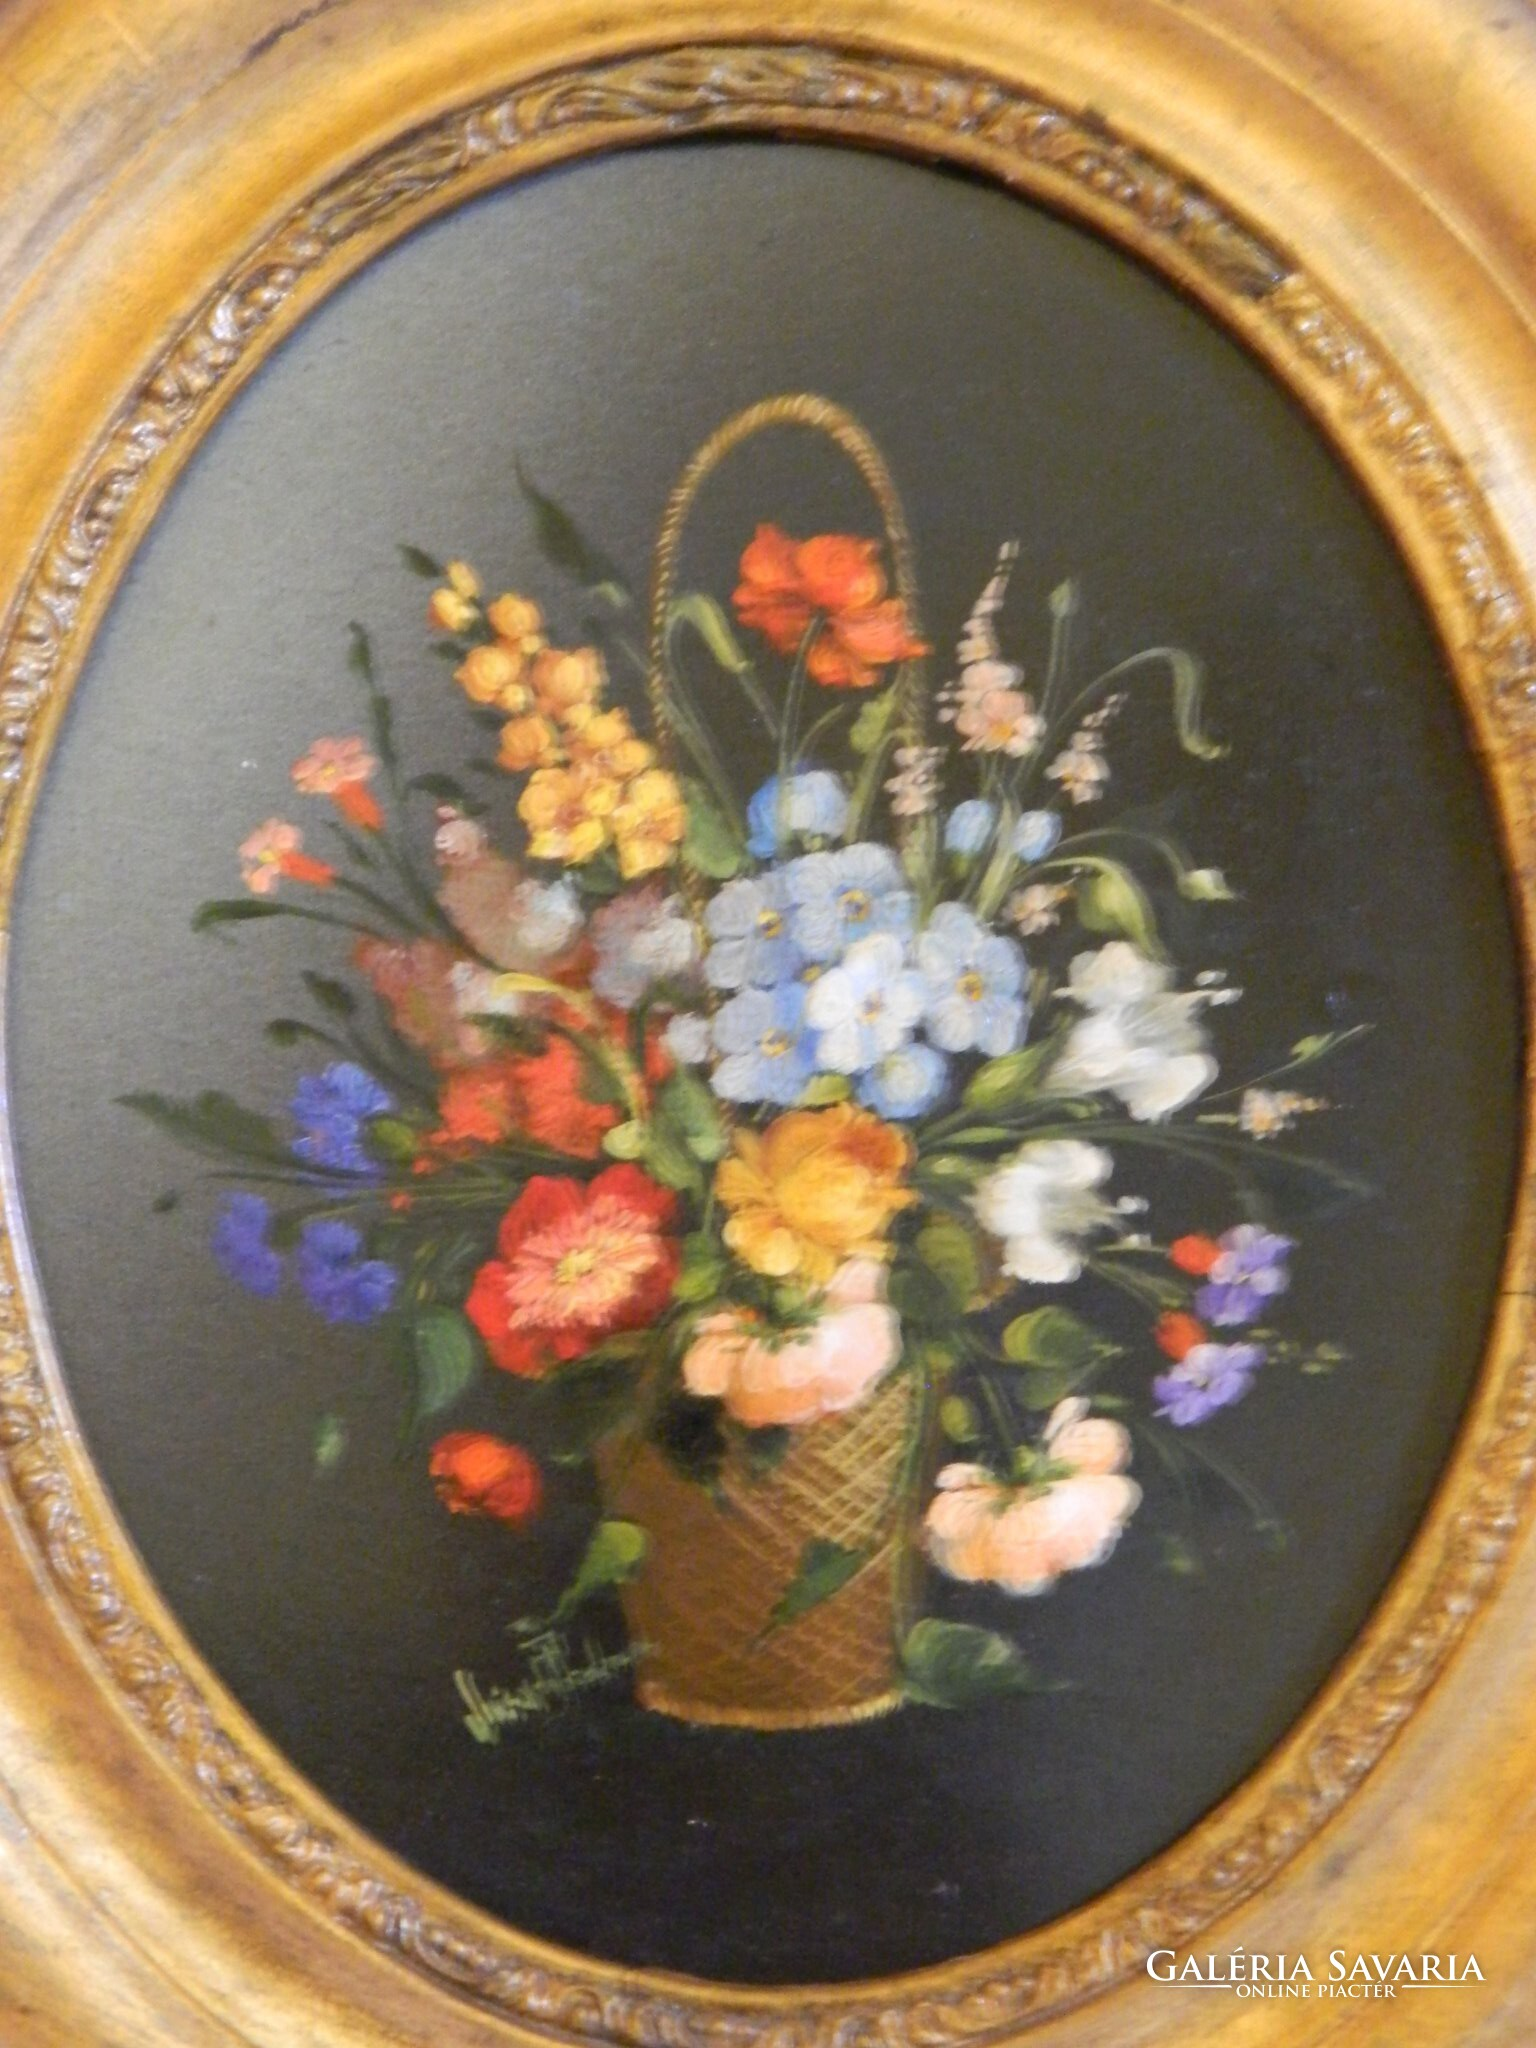 7a795fc8b8 Luisa da Pordenone virág csendélet - Festmény   Galéria Savaria ...